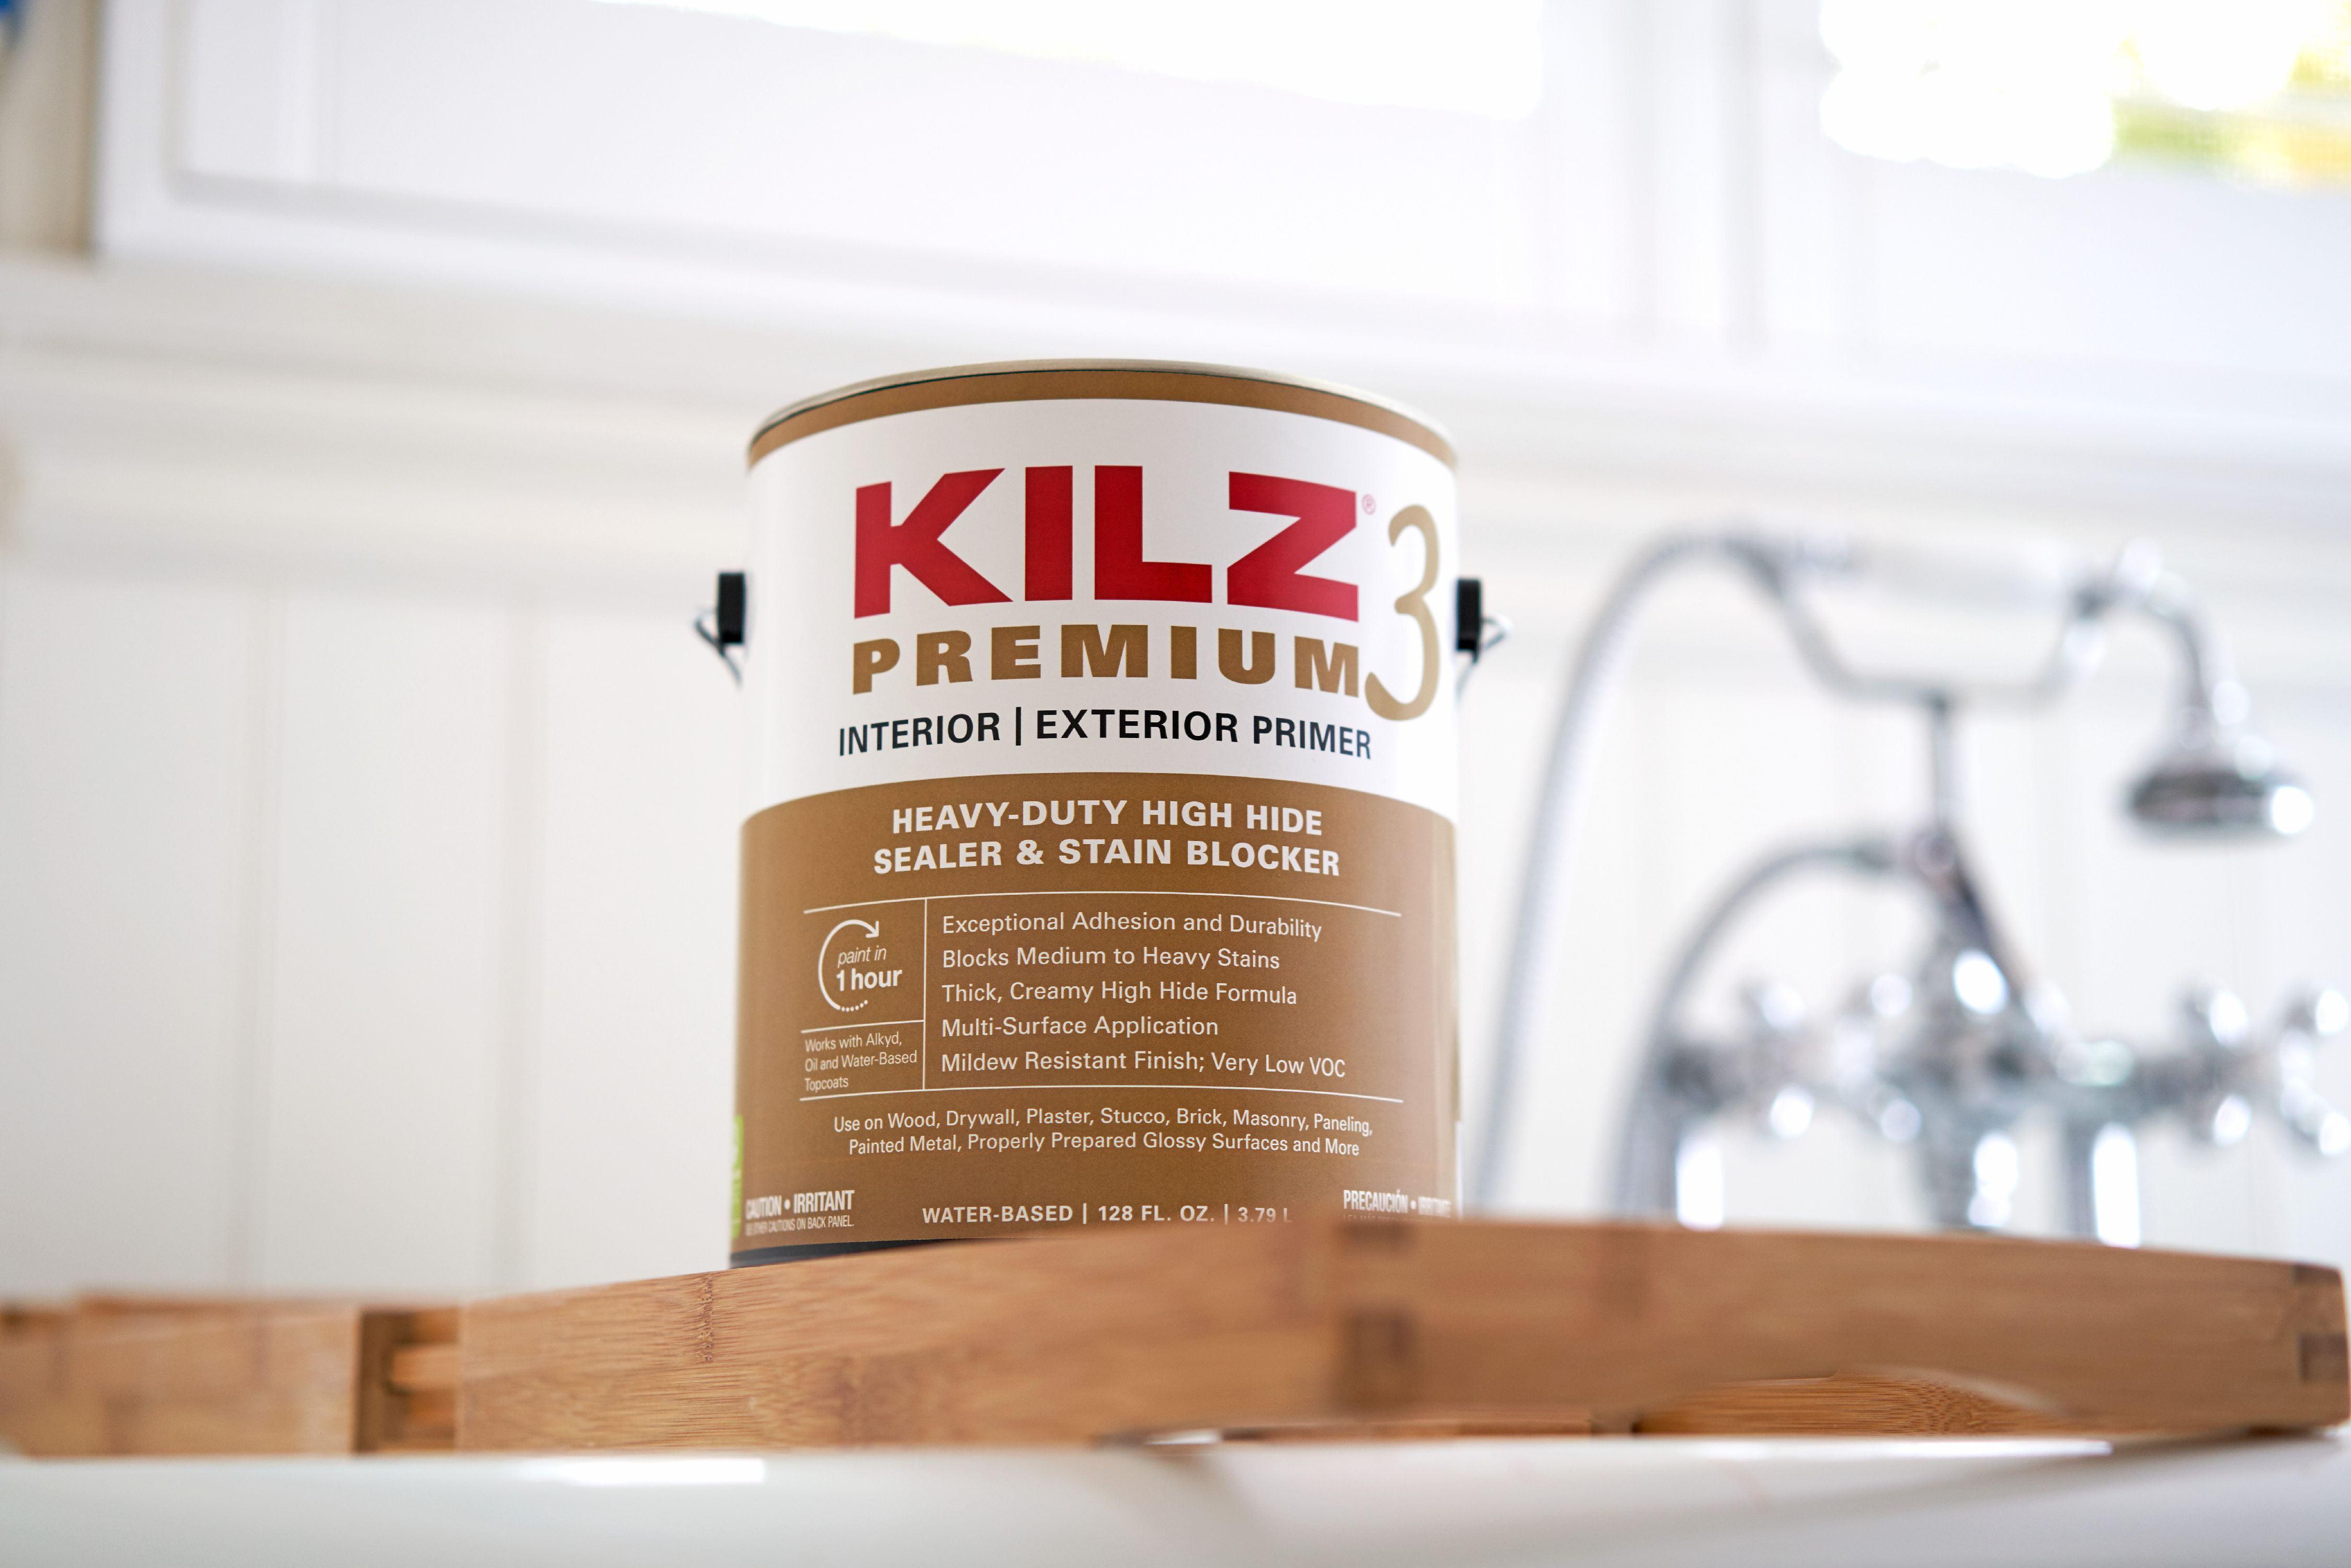 abfda54c9c KILZ 3 Premium Interior/Exterior Primer, Sealer & Stainblocker, White - New  Look, Same Trusted Formula - Walmart.com